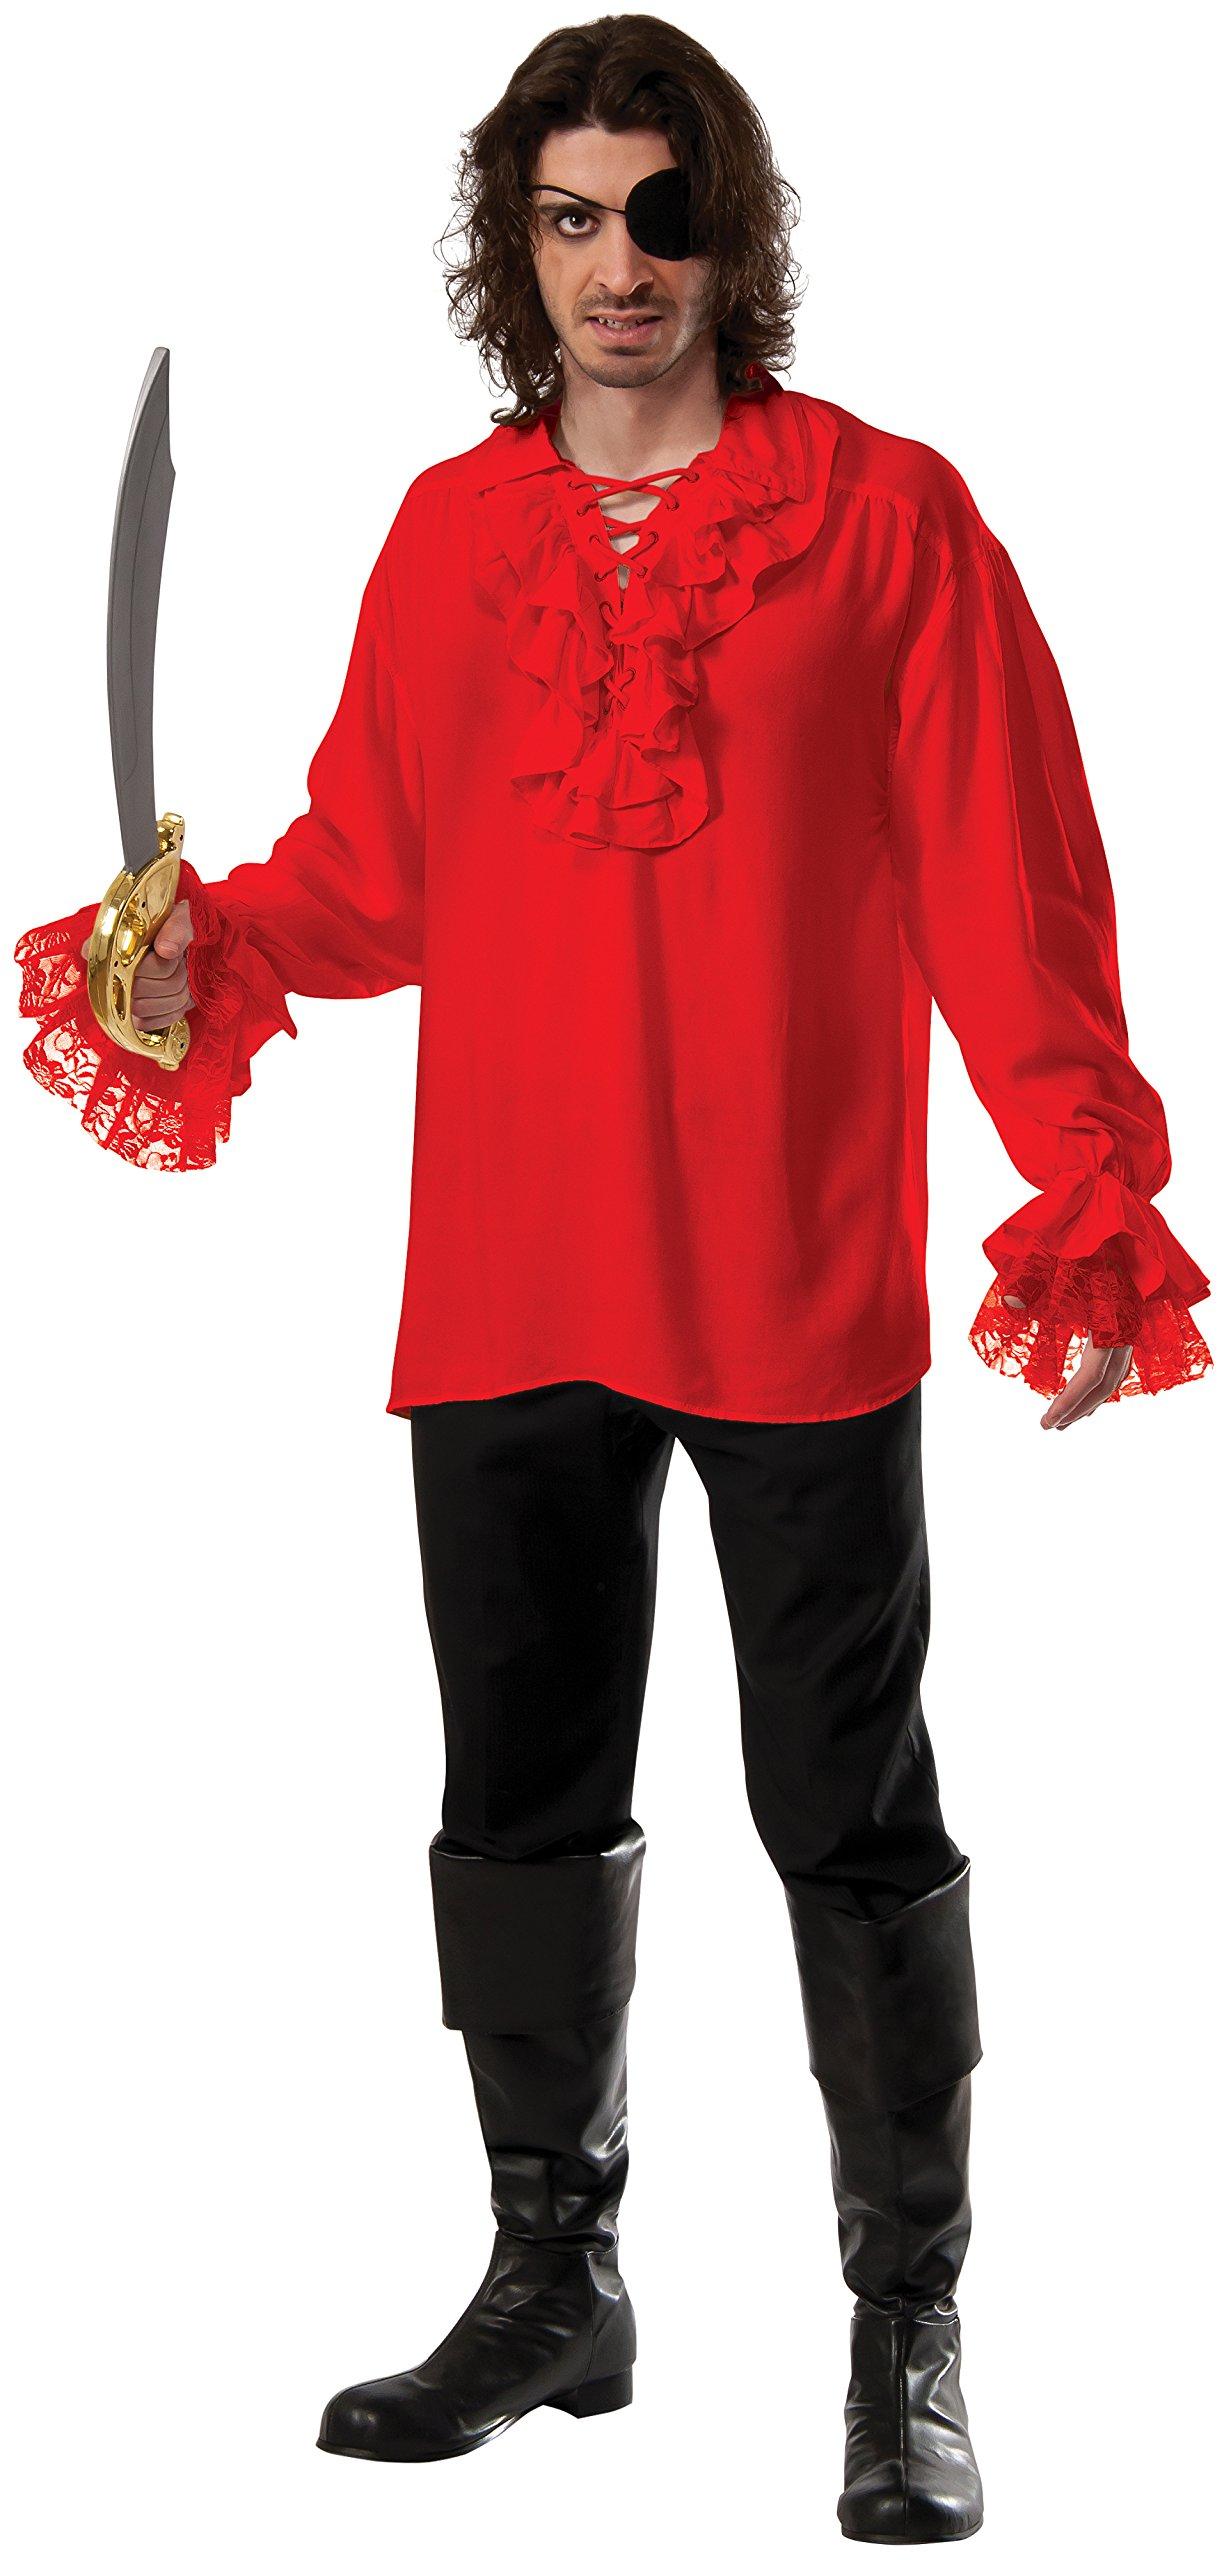 Rubie's Costume Co Men's Ruffled Cotton Pirate Shirt, Red, Standard